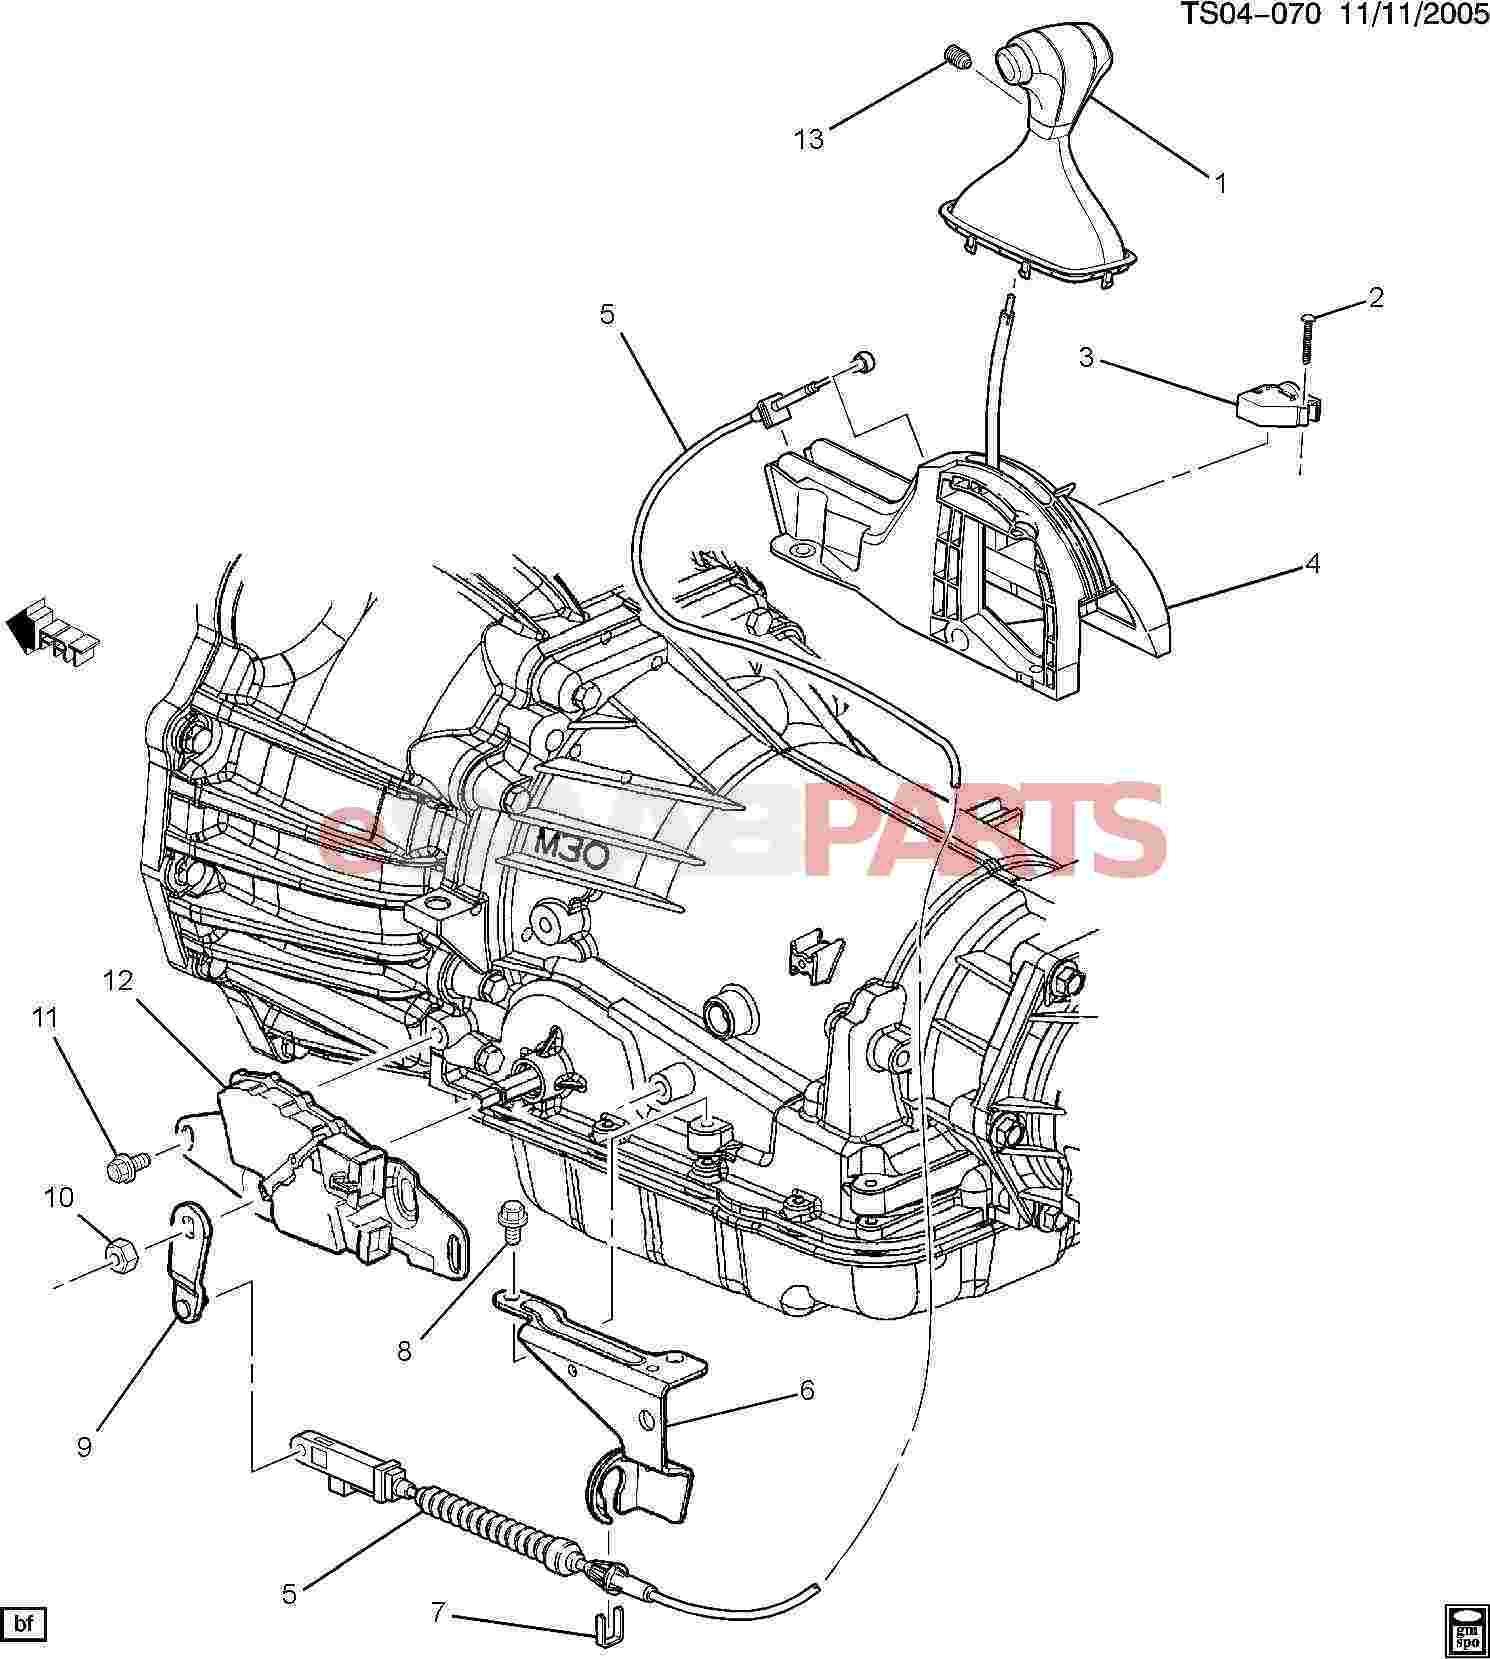 Saab Retainer A Trns Range Sel Lvr Cbl